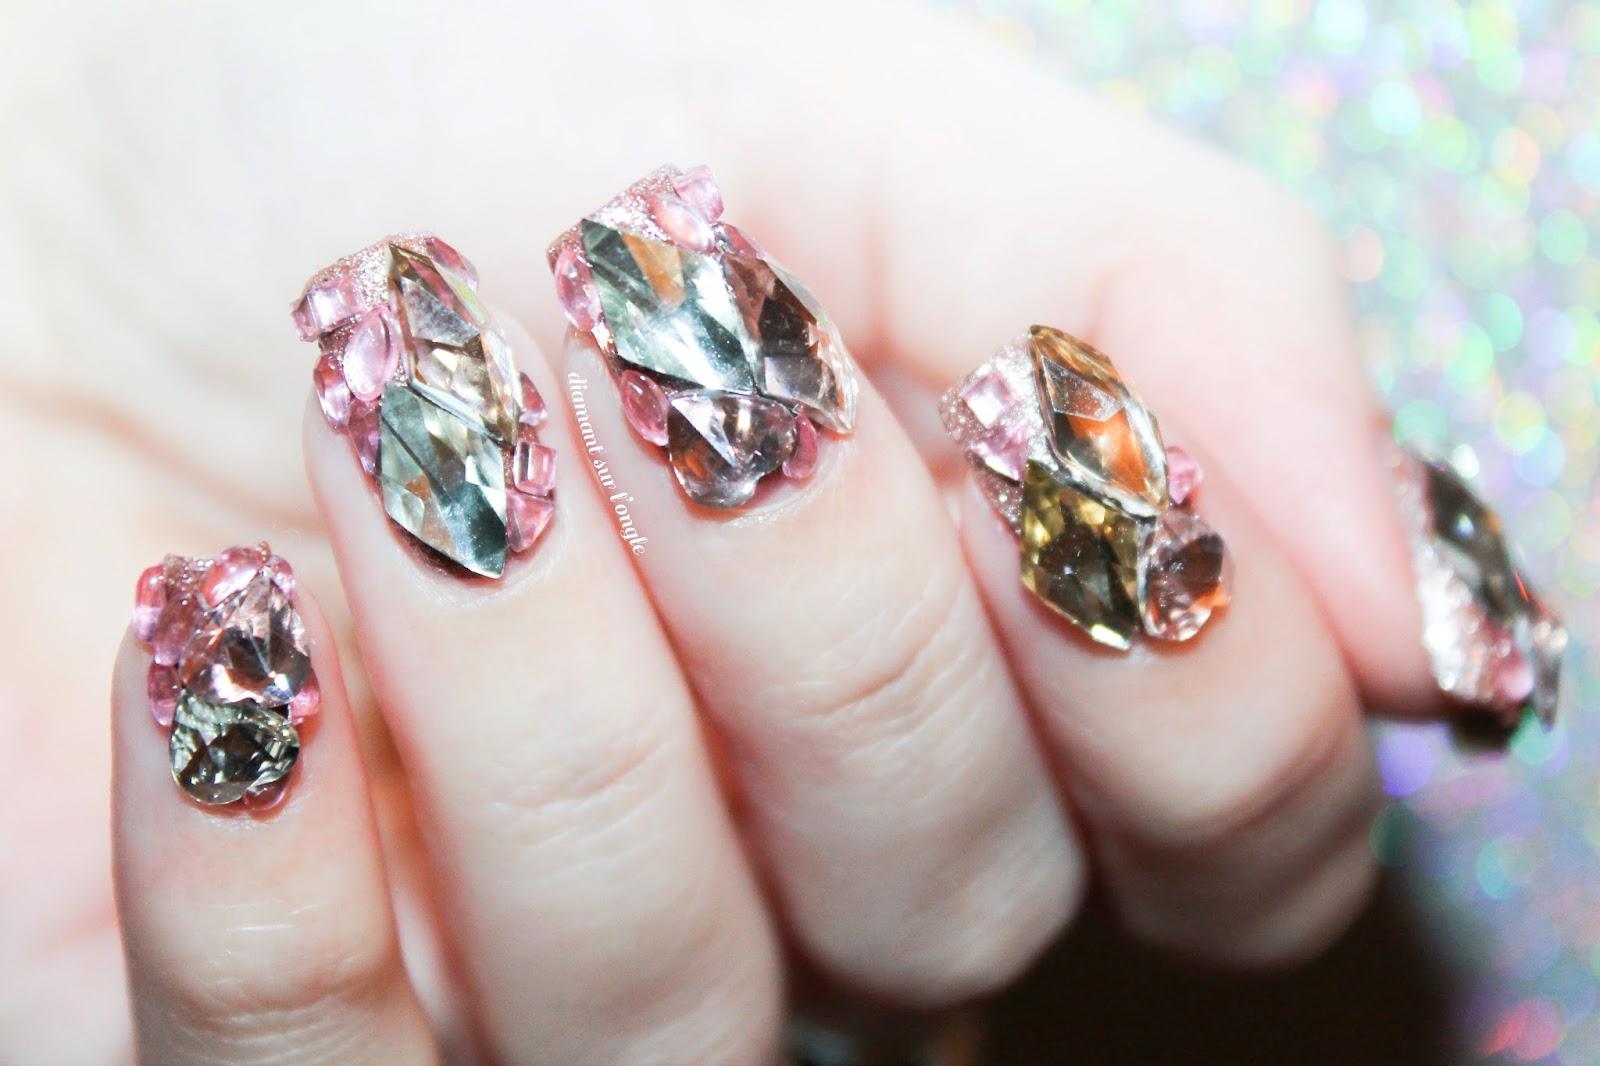 Diamant sur l 39 ongle ongles en 3d nailstorming - Nail art discret ...